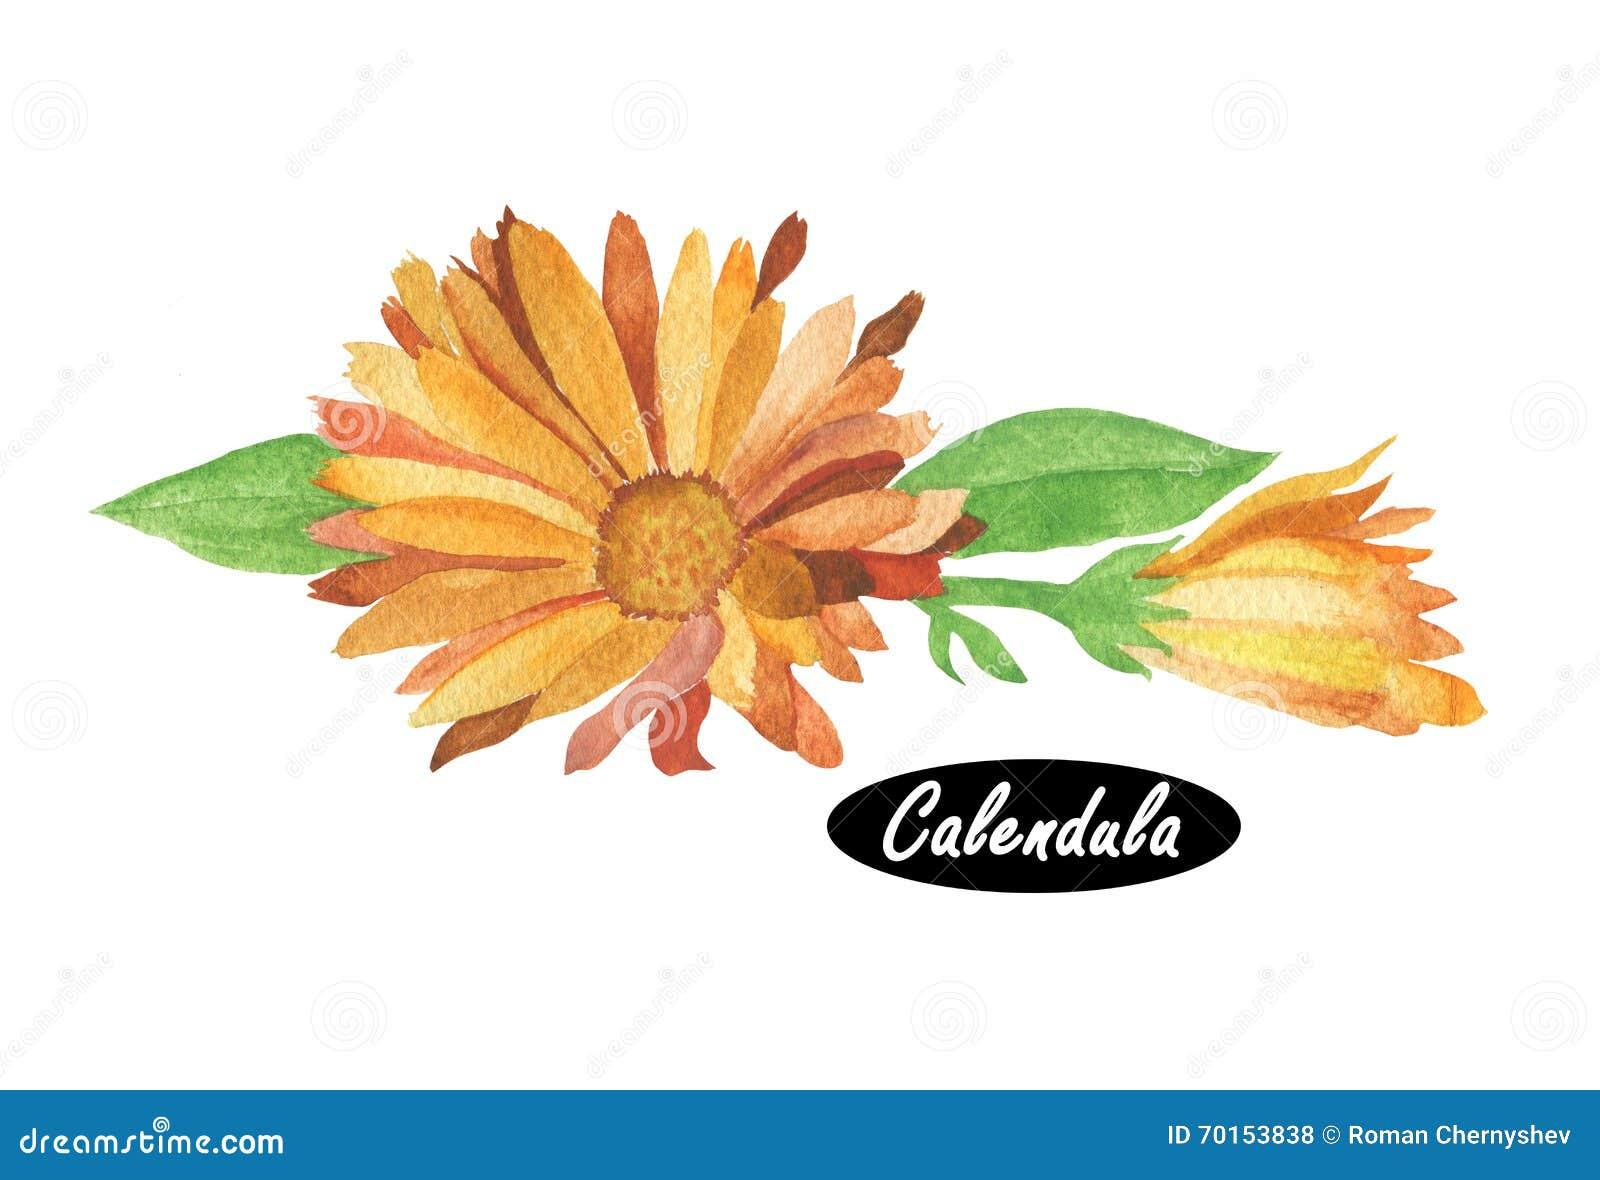 watercolor calendula illustration stock illustration illustration